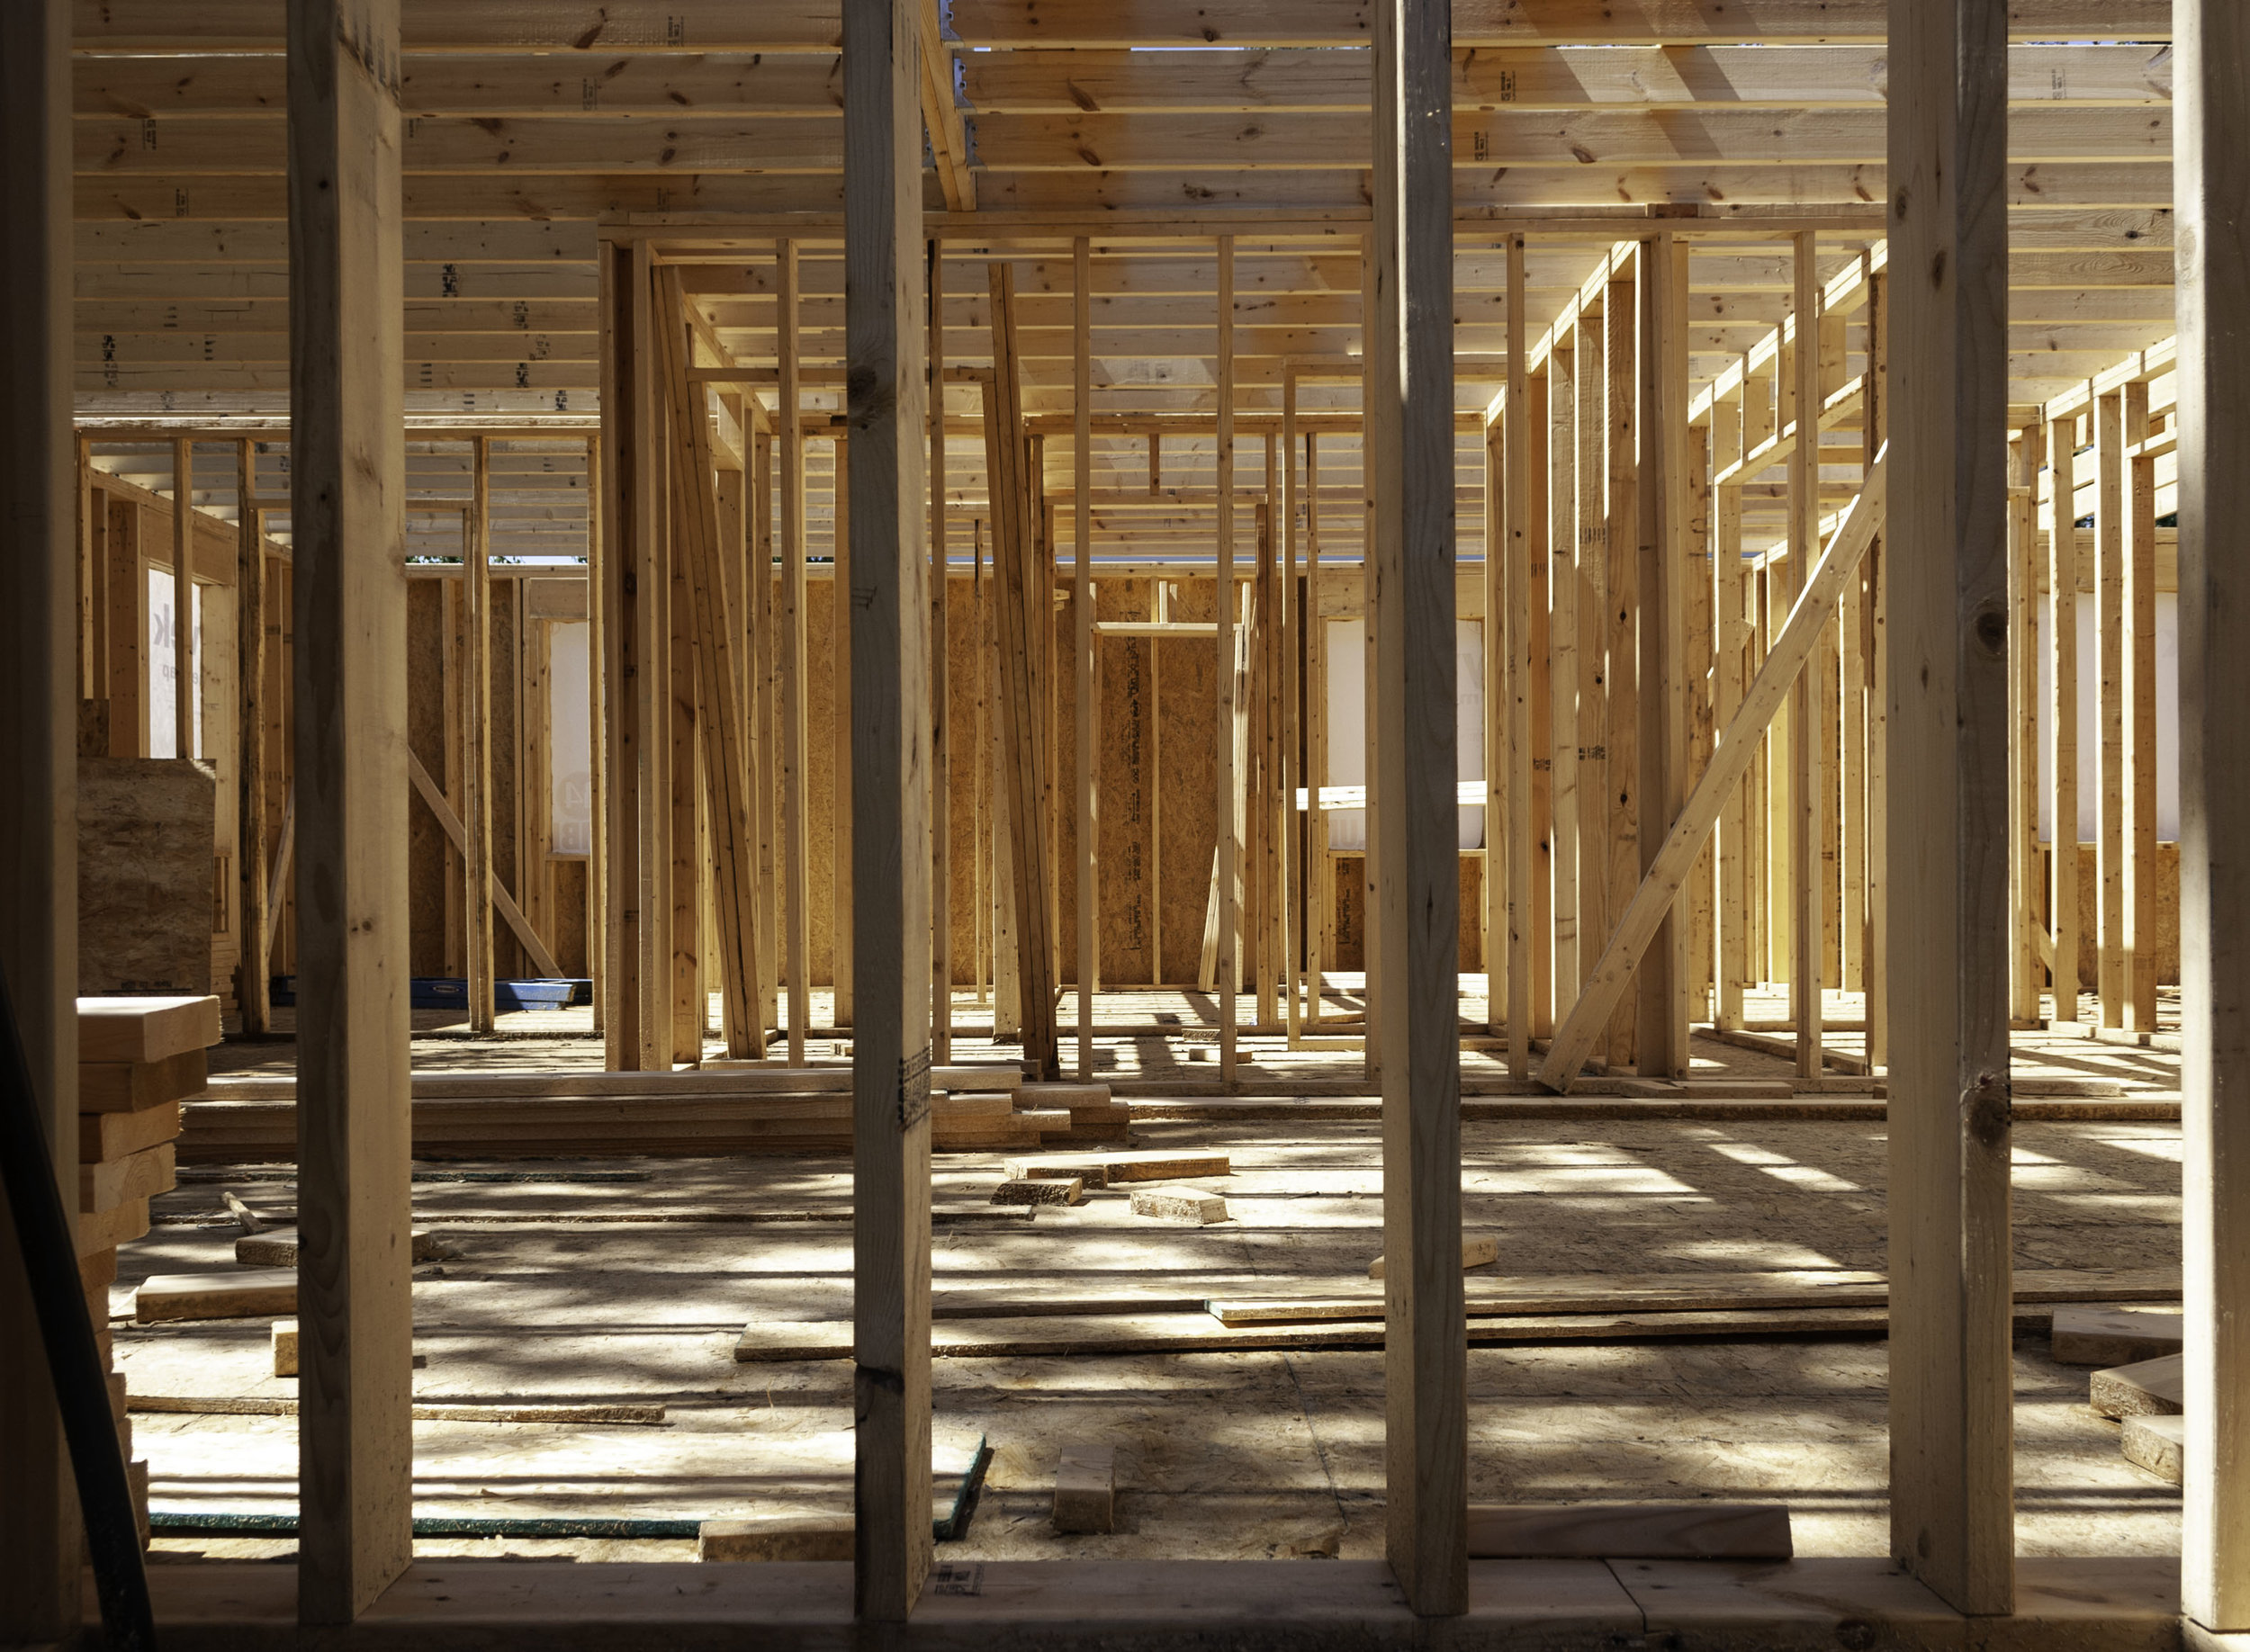 londontown build across interior.jpg